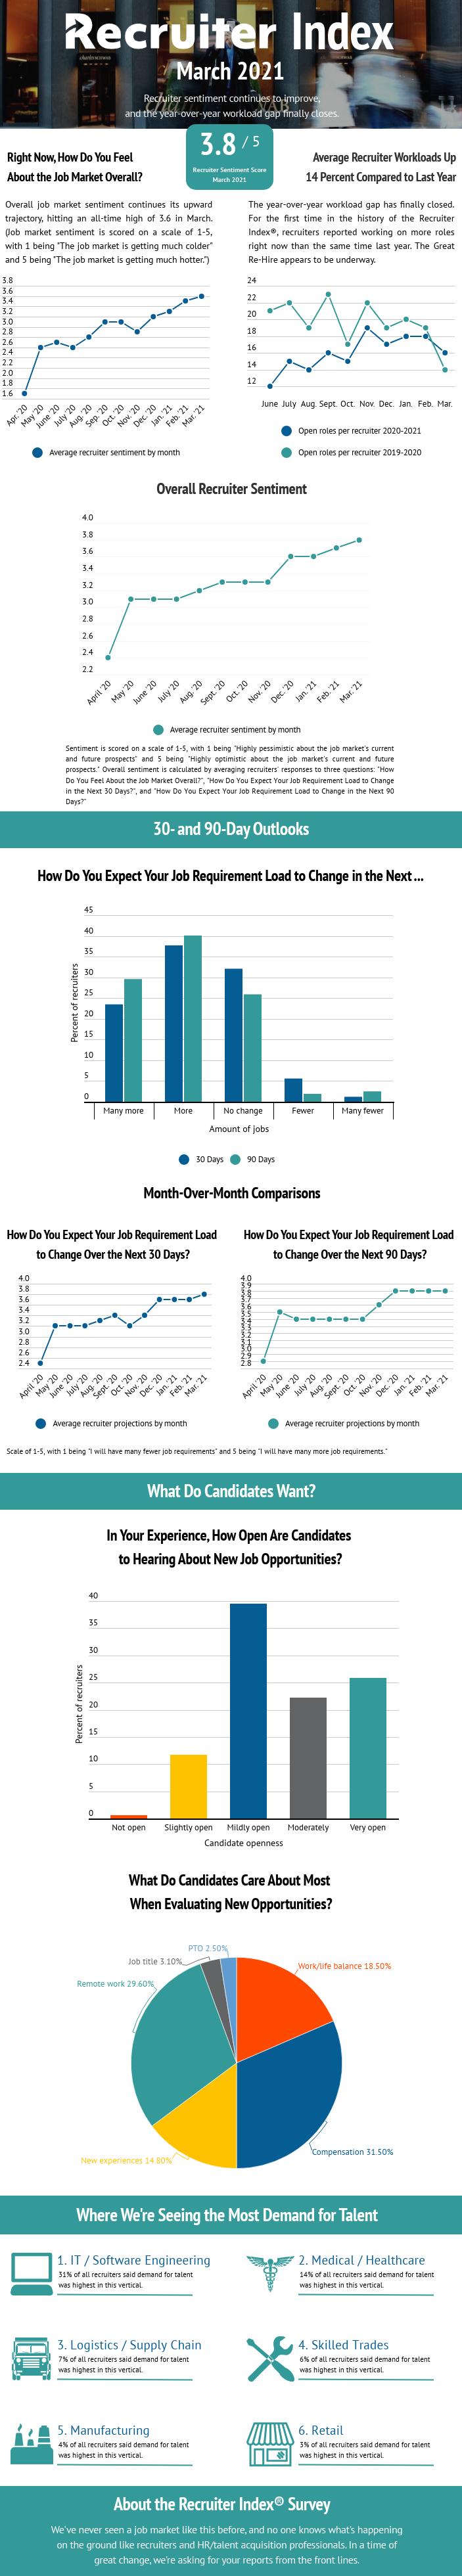 recruiter-index-infographic-march-2021